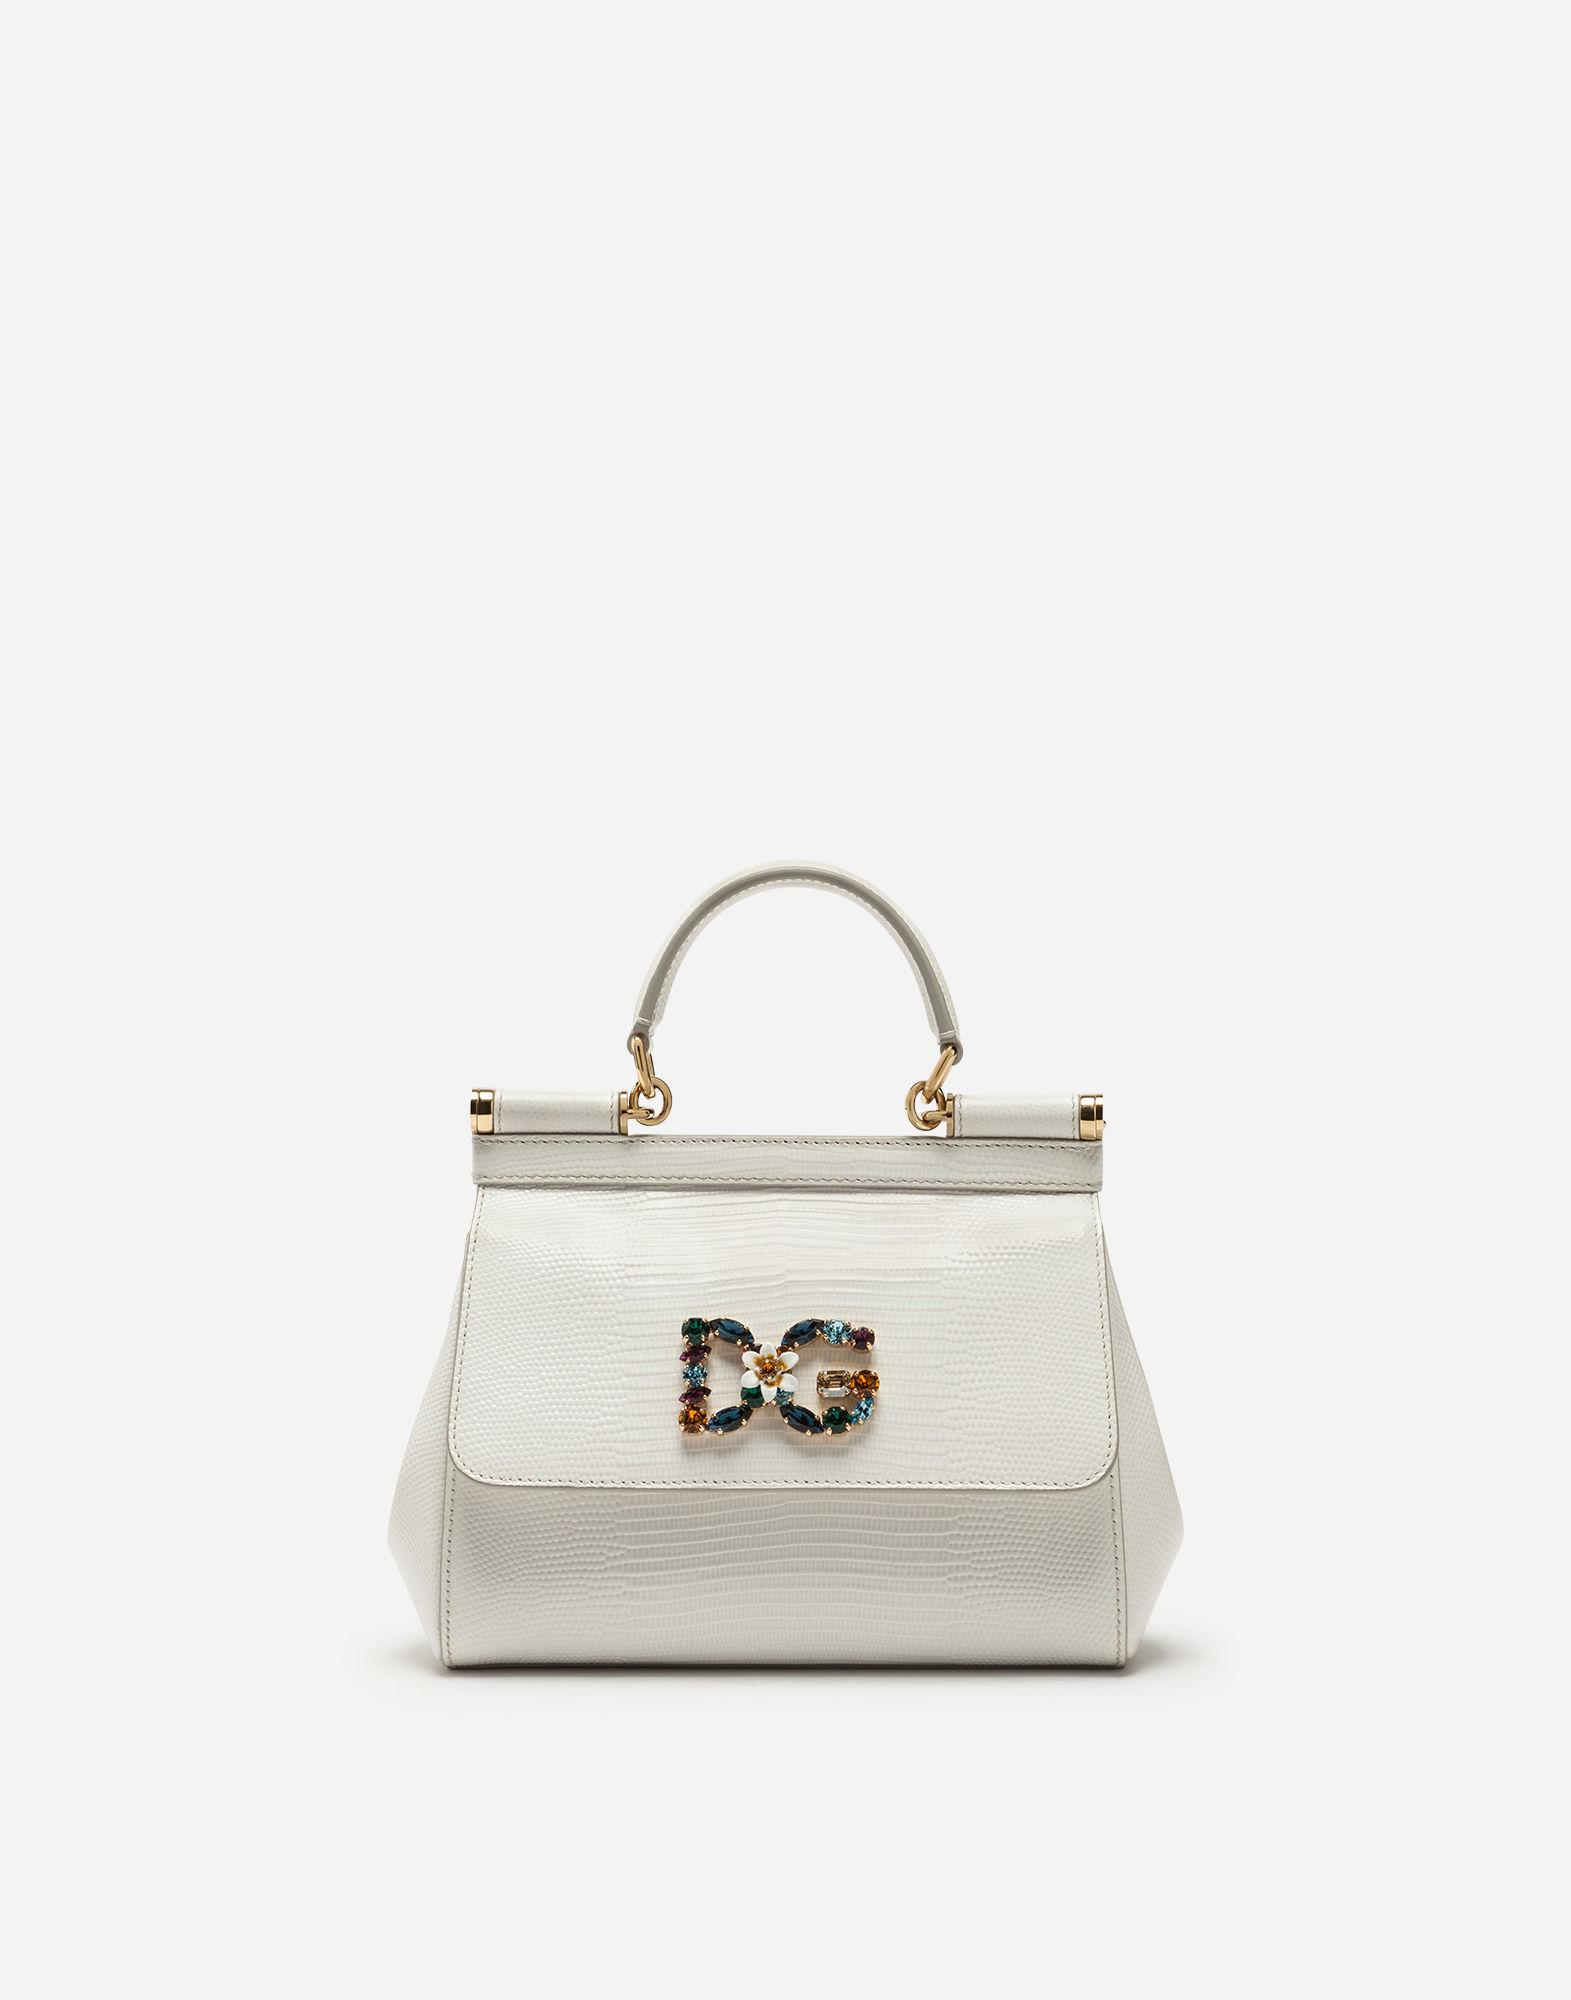 e9b555e197d4f8 Dolce & Gabbana Small Calfskin Sicily Bag With Iguana-print And Dg ...